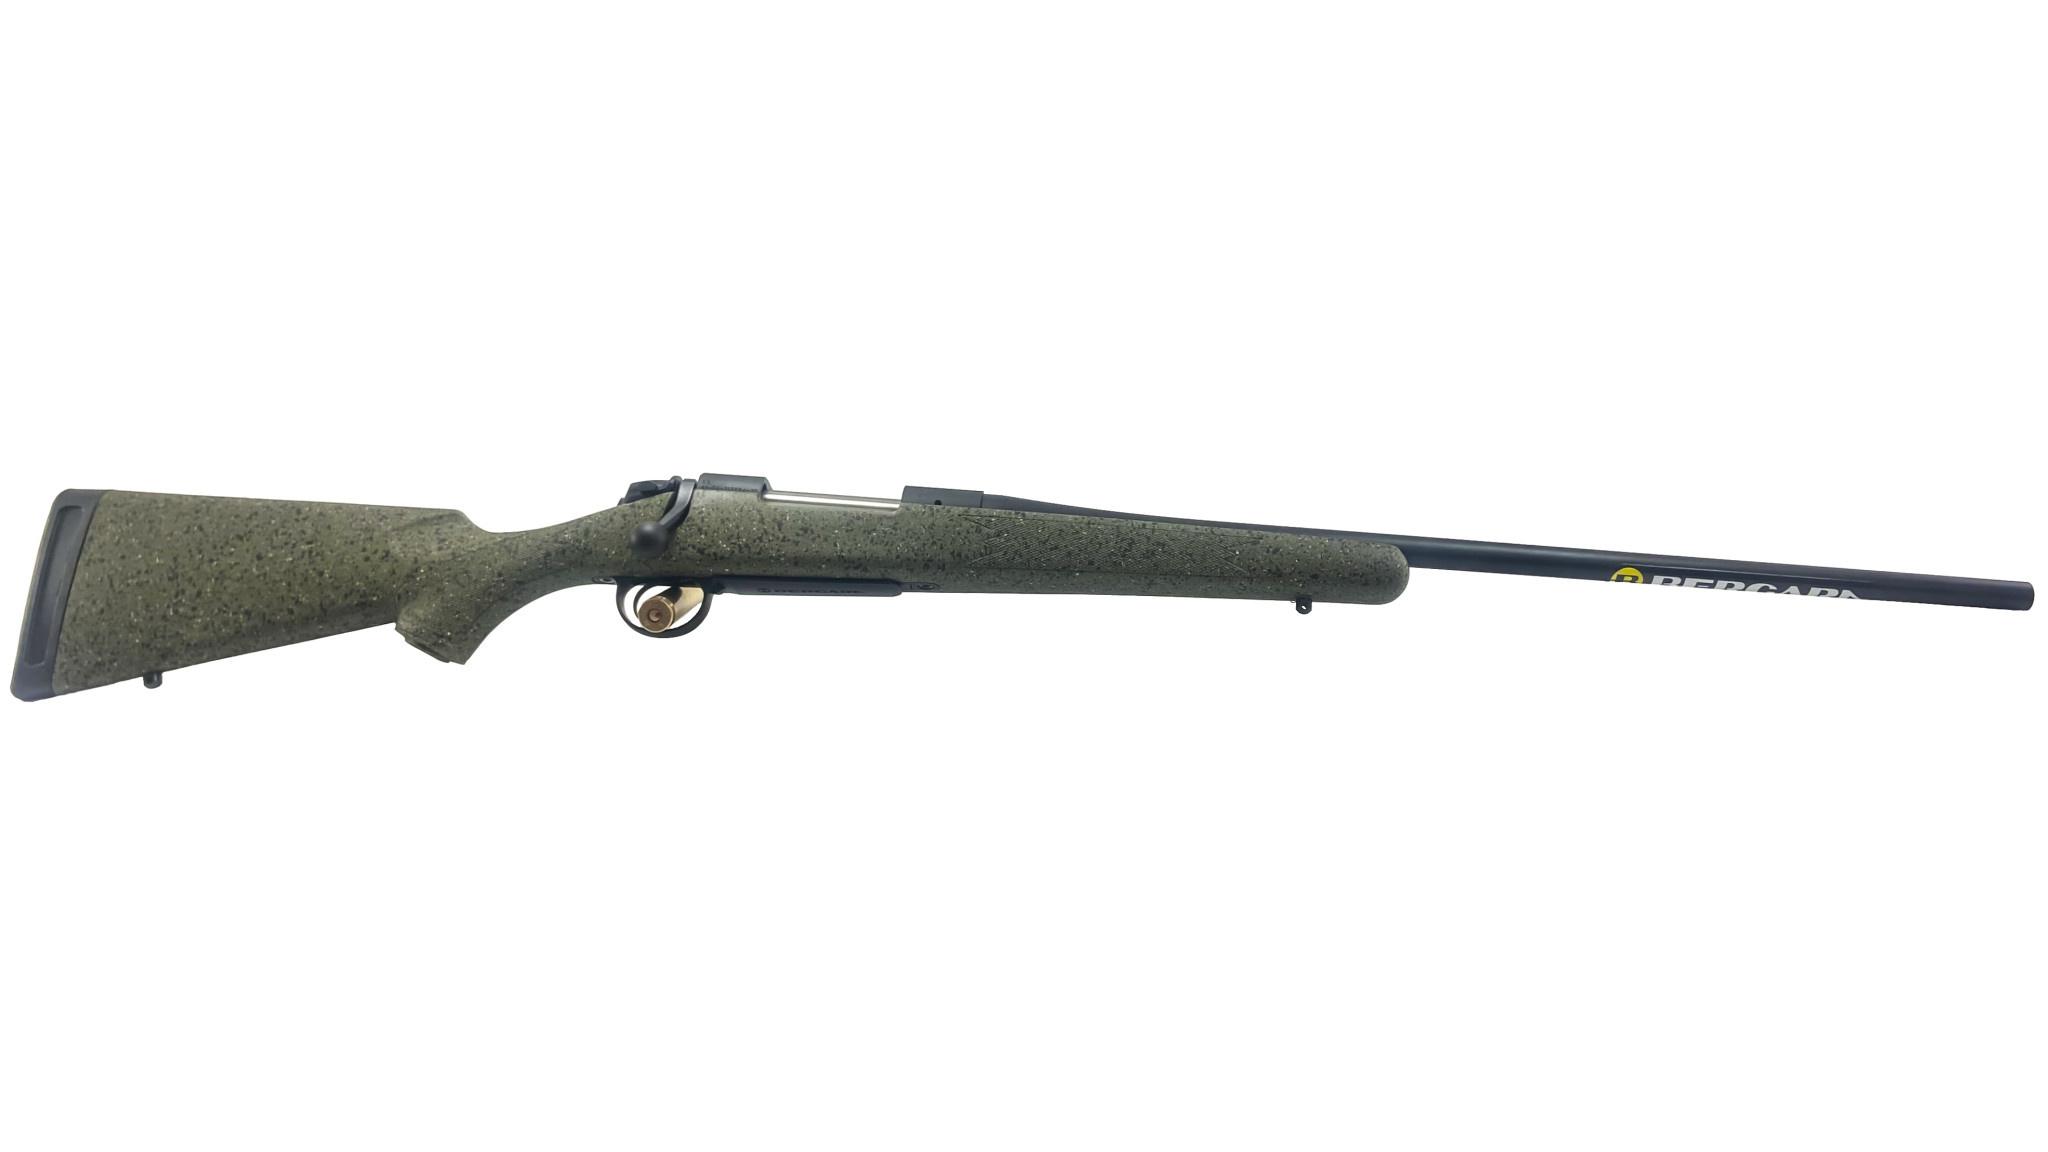 "Bergara B14 Hunter .30-06 Spfd 24"" Barrel"